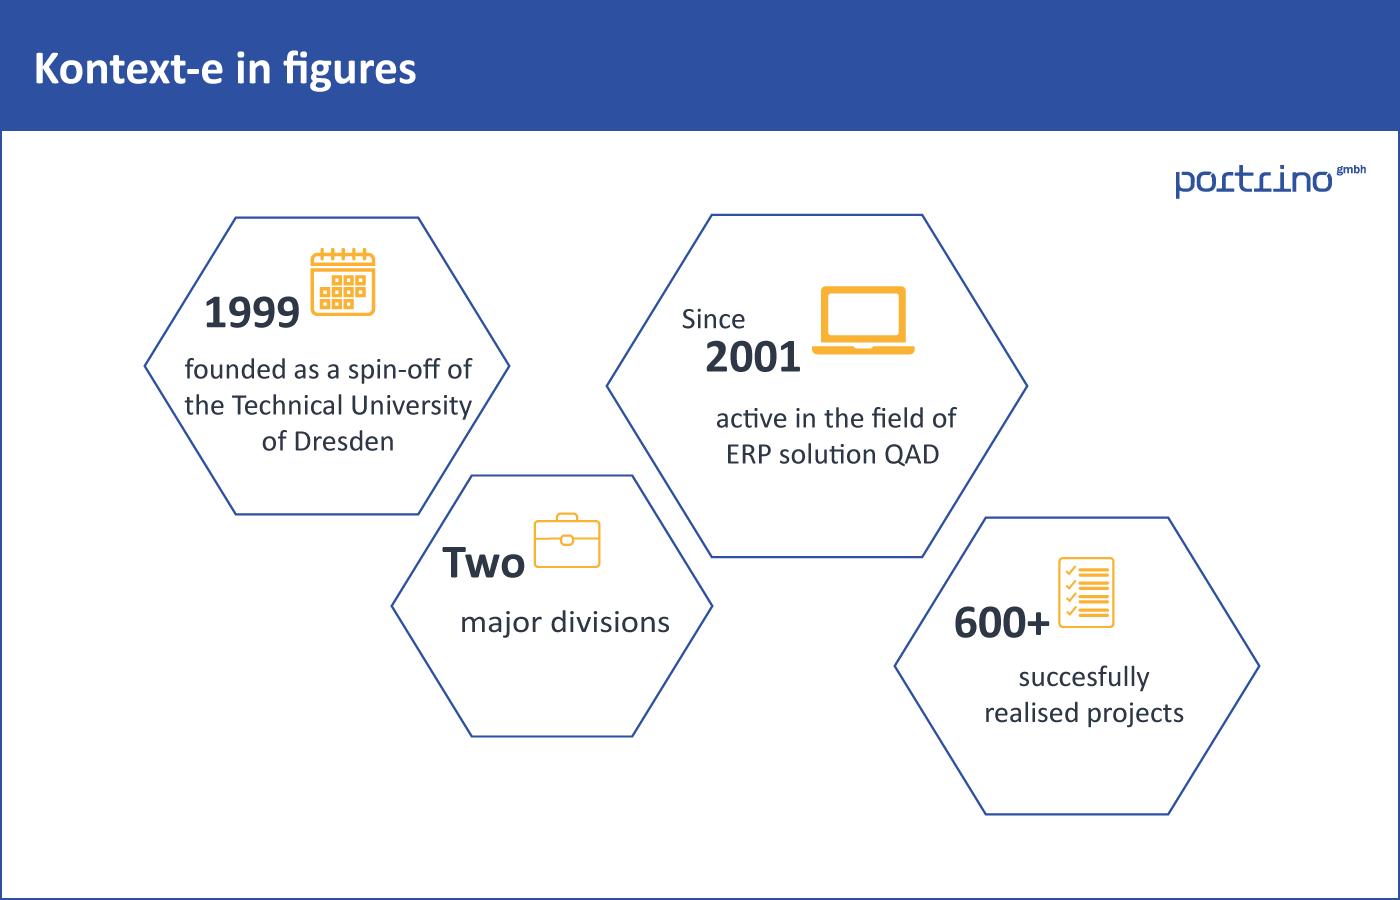 Kontext-e in figures